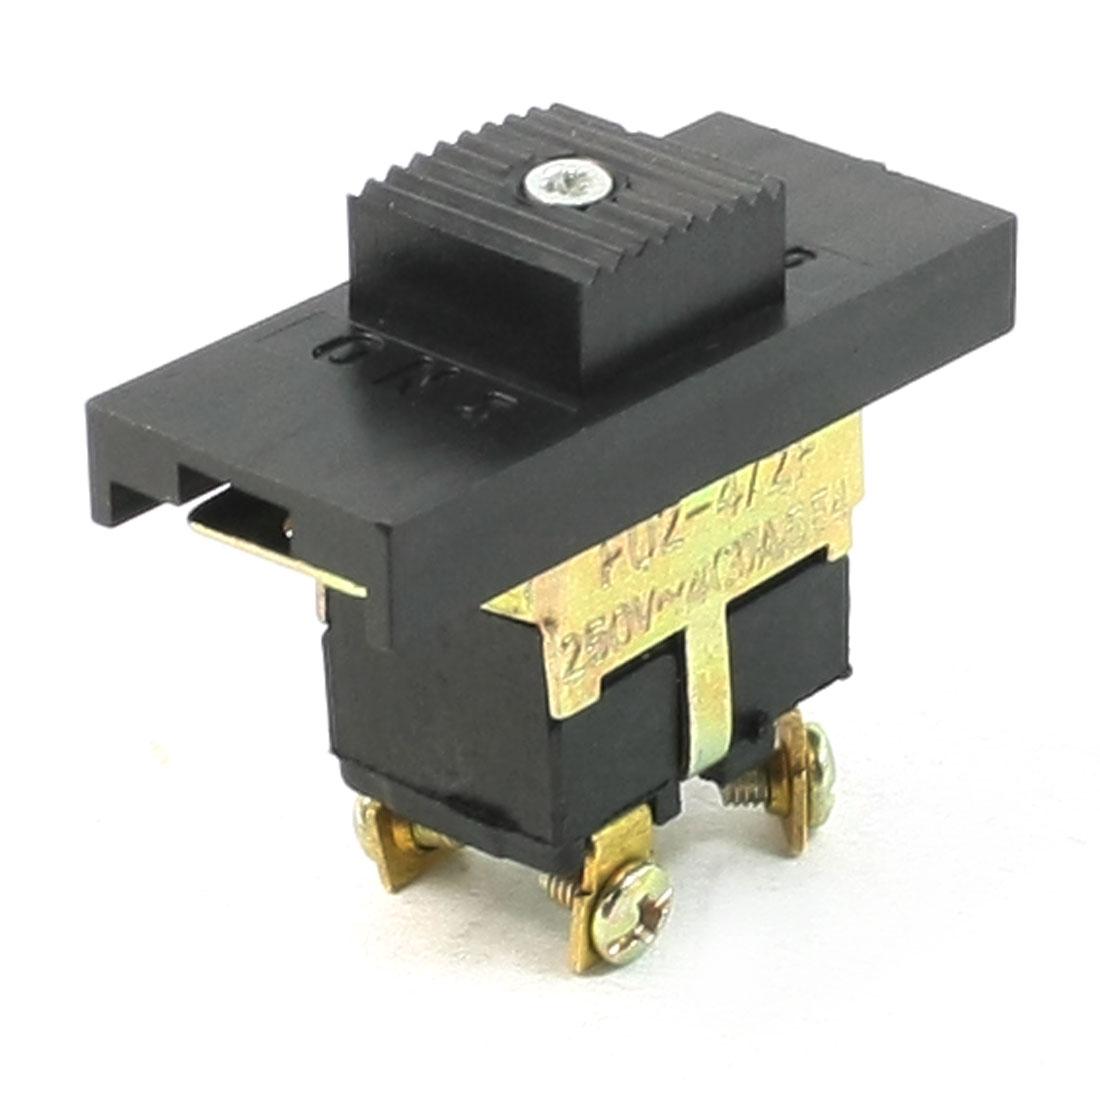 AC250V 4A On/Off Mark Finishing Sander Slide Switch for Makita 9045